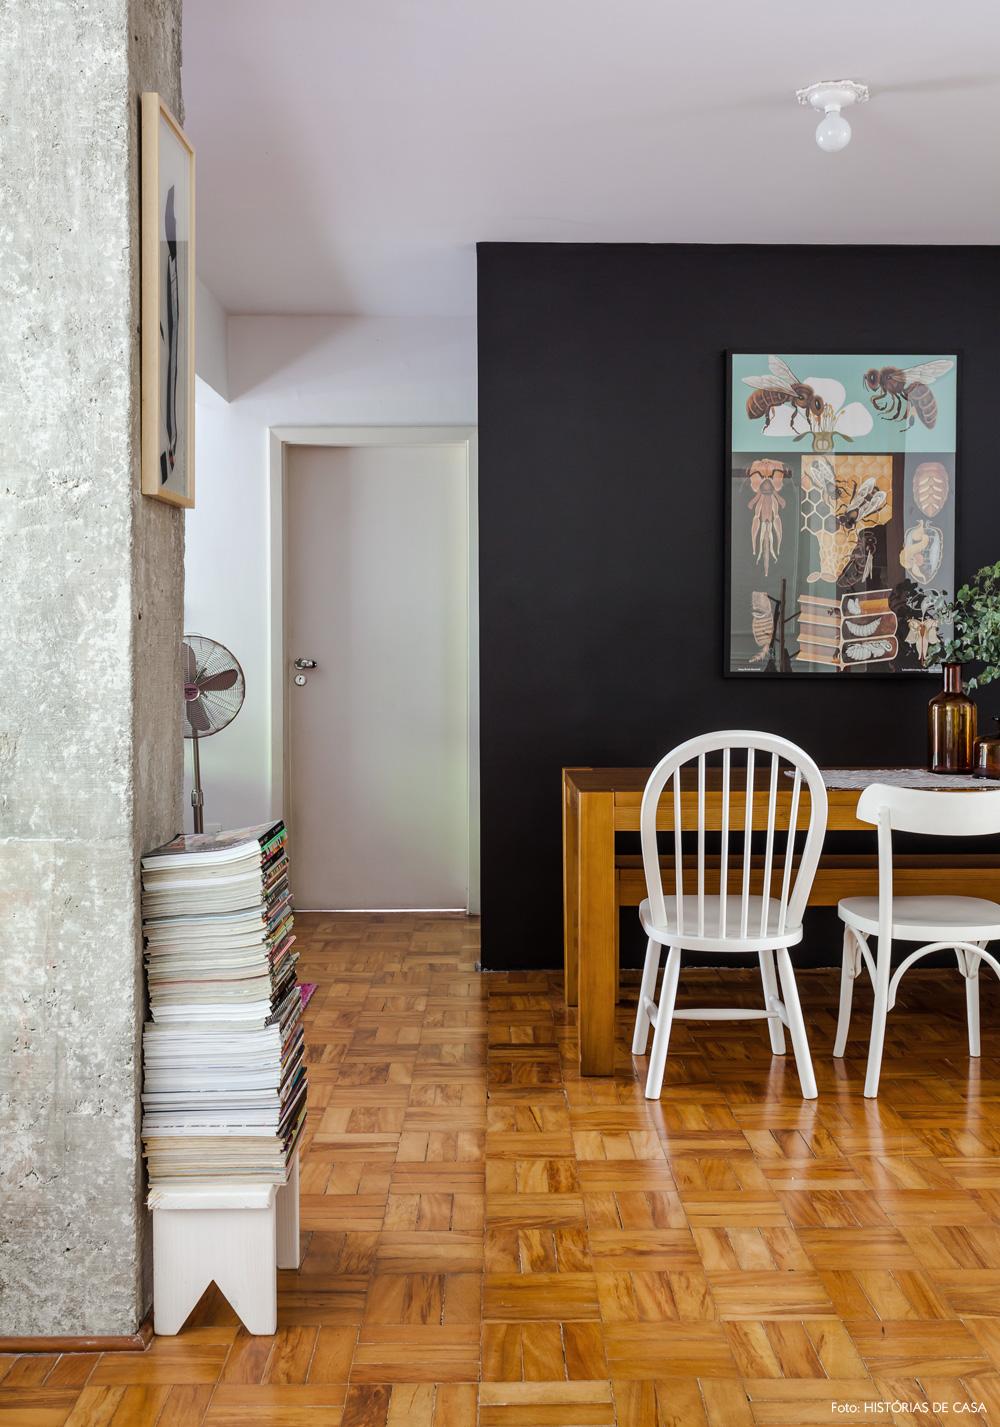 14-decoracao-sala-de-jantar-parede-preta-cadeiras-brancas